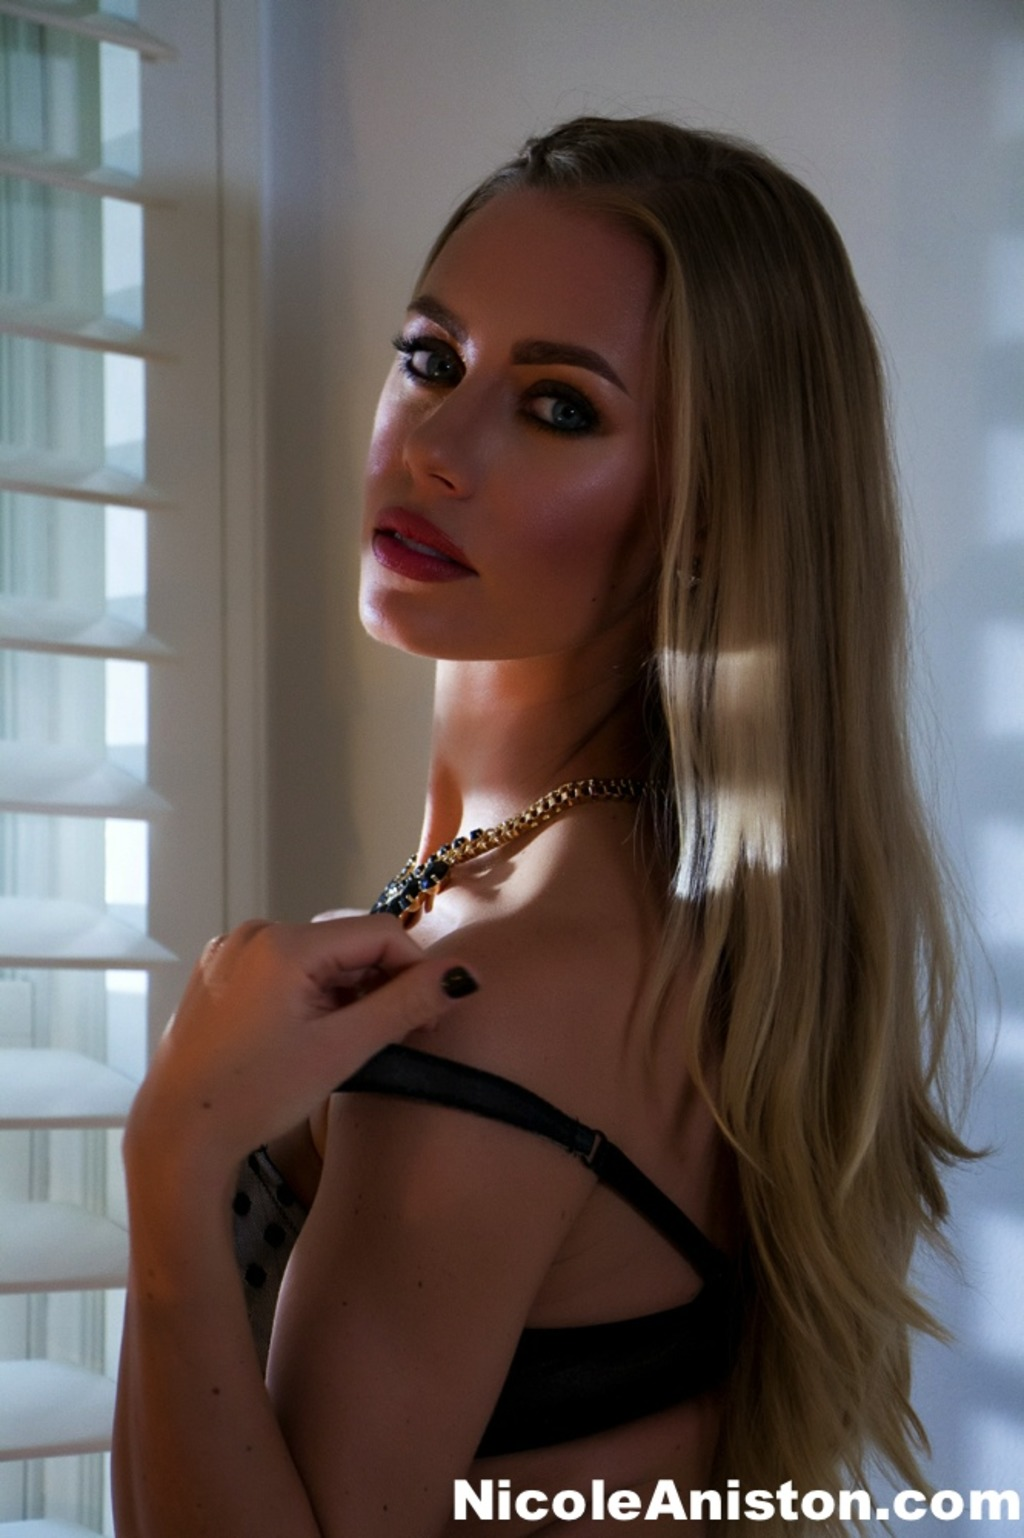 Nicole Aniston.Com